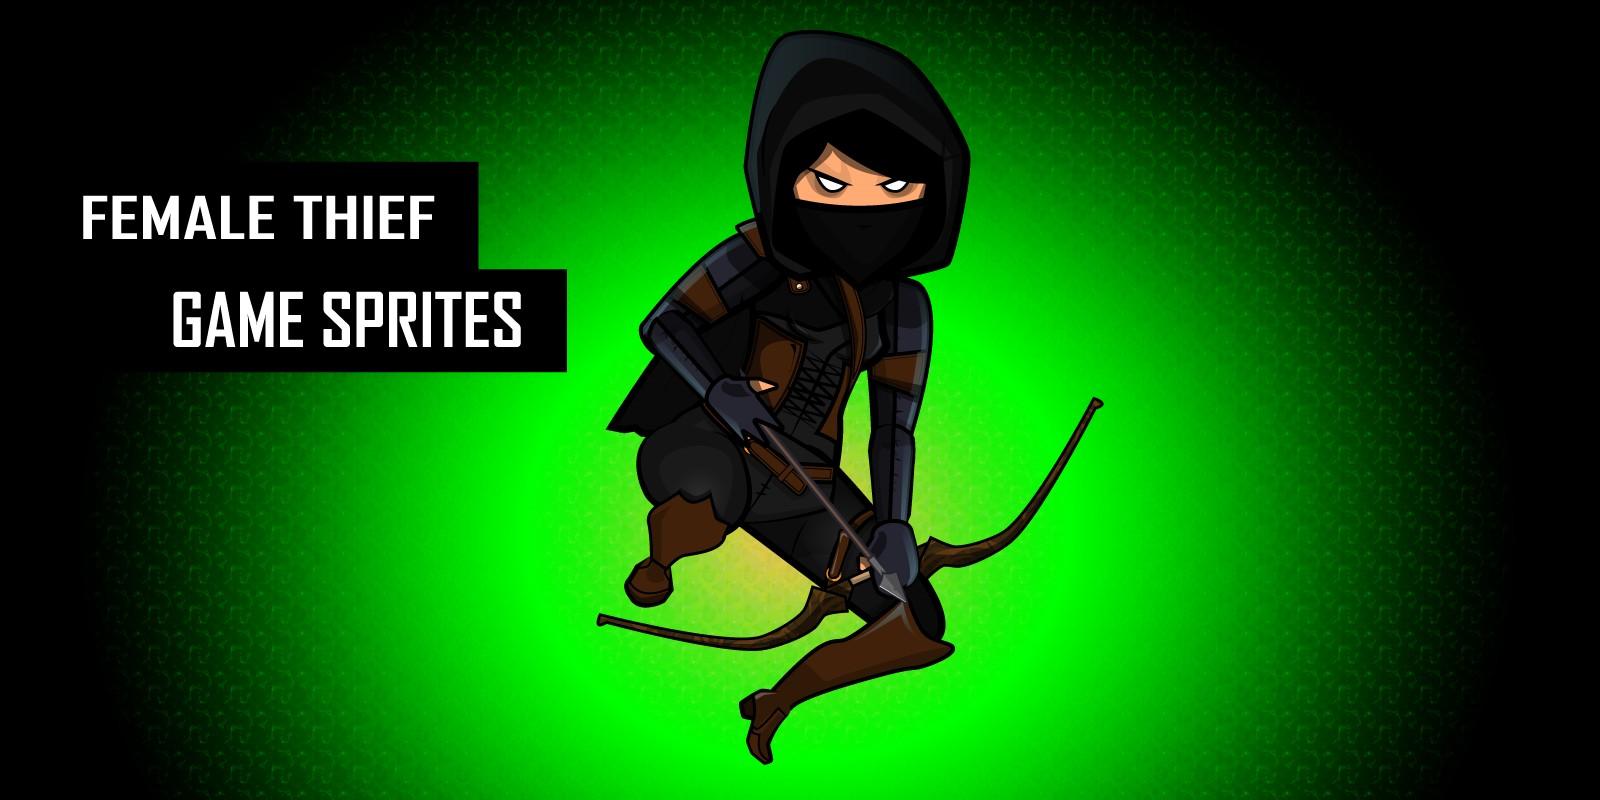 Female Dark Thief Character Sprites